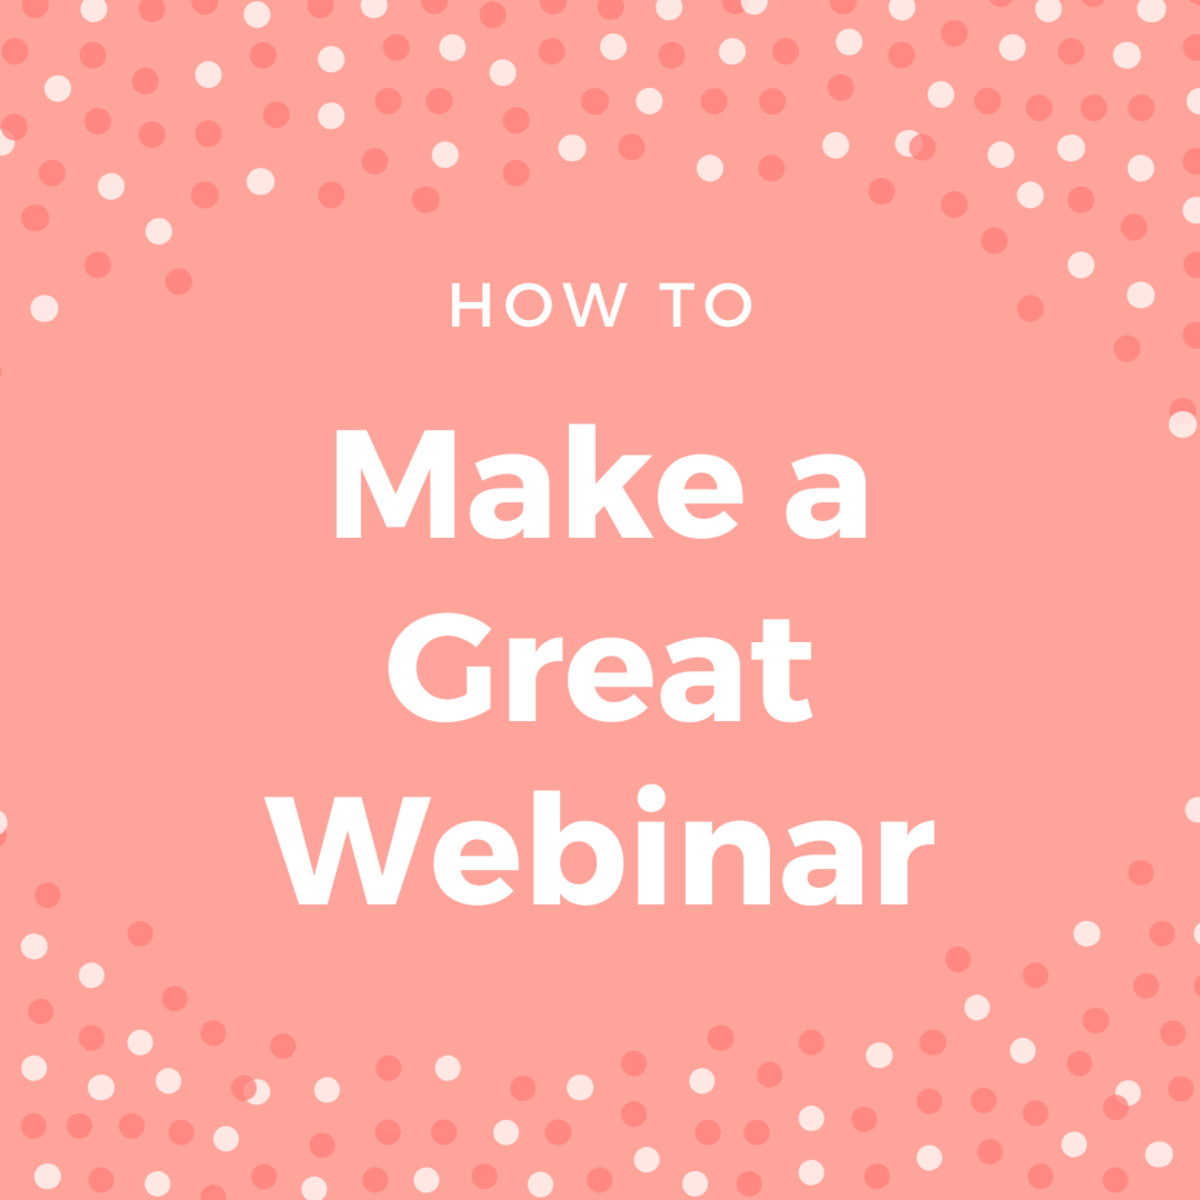 How to Make a Great Webinar